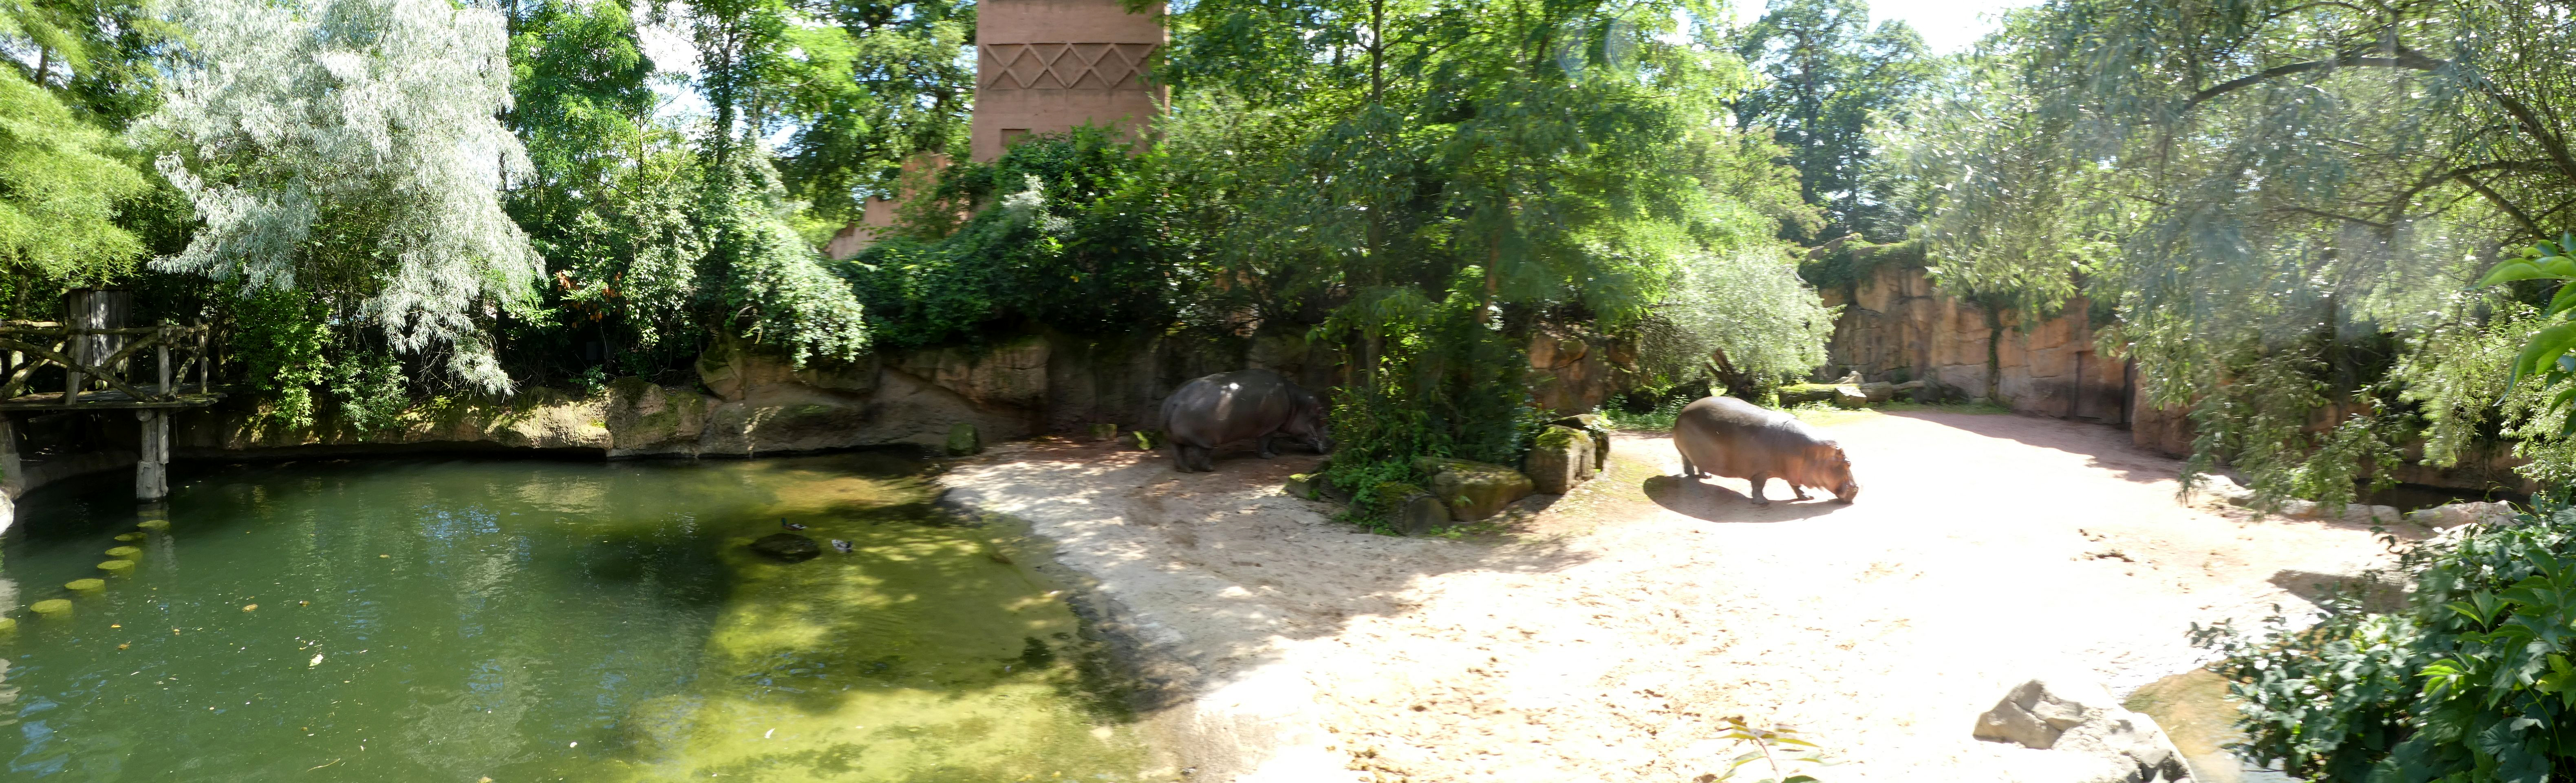 Flusspferd  (9)